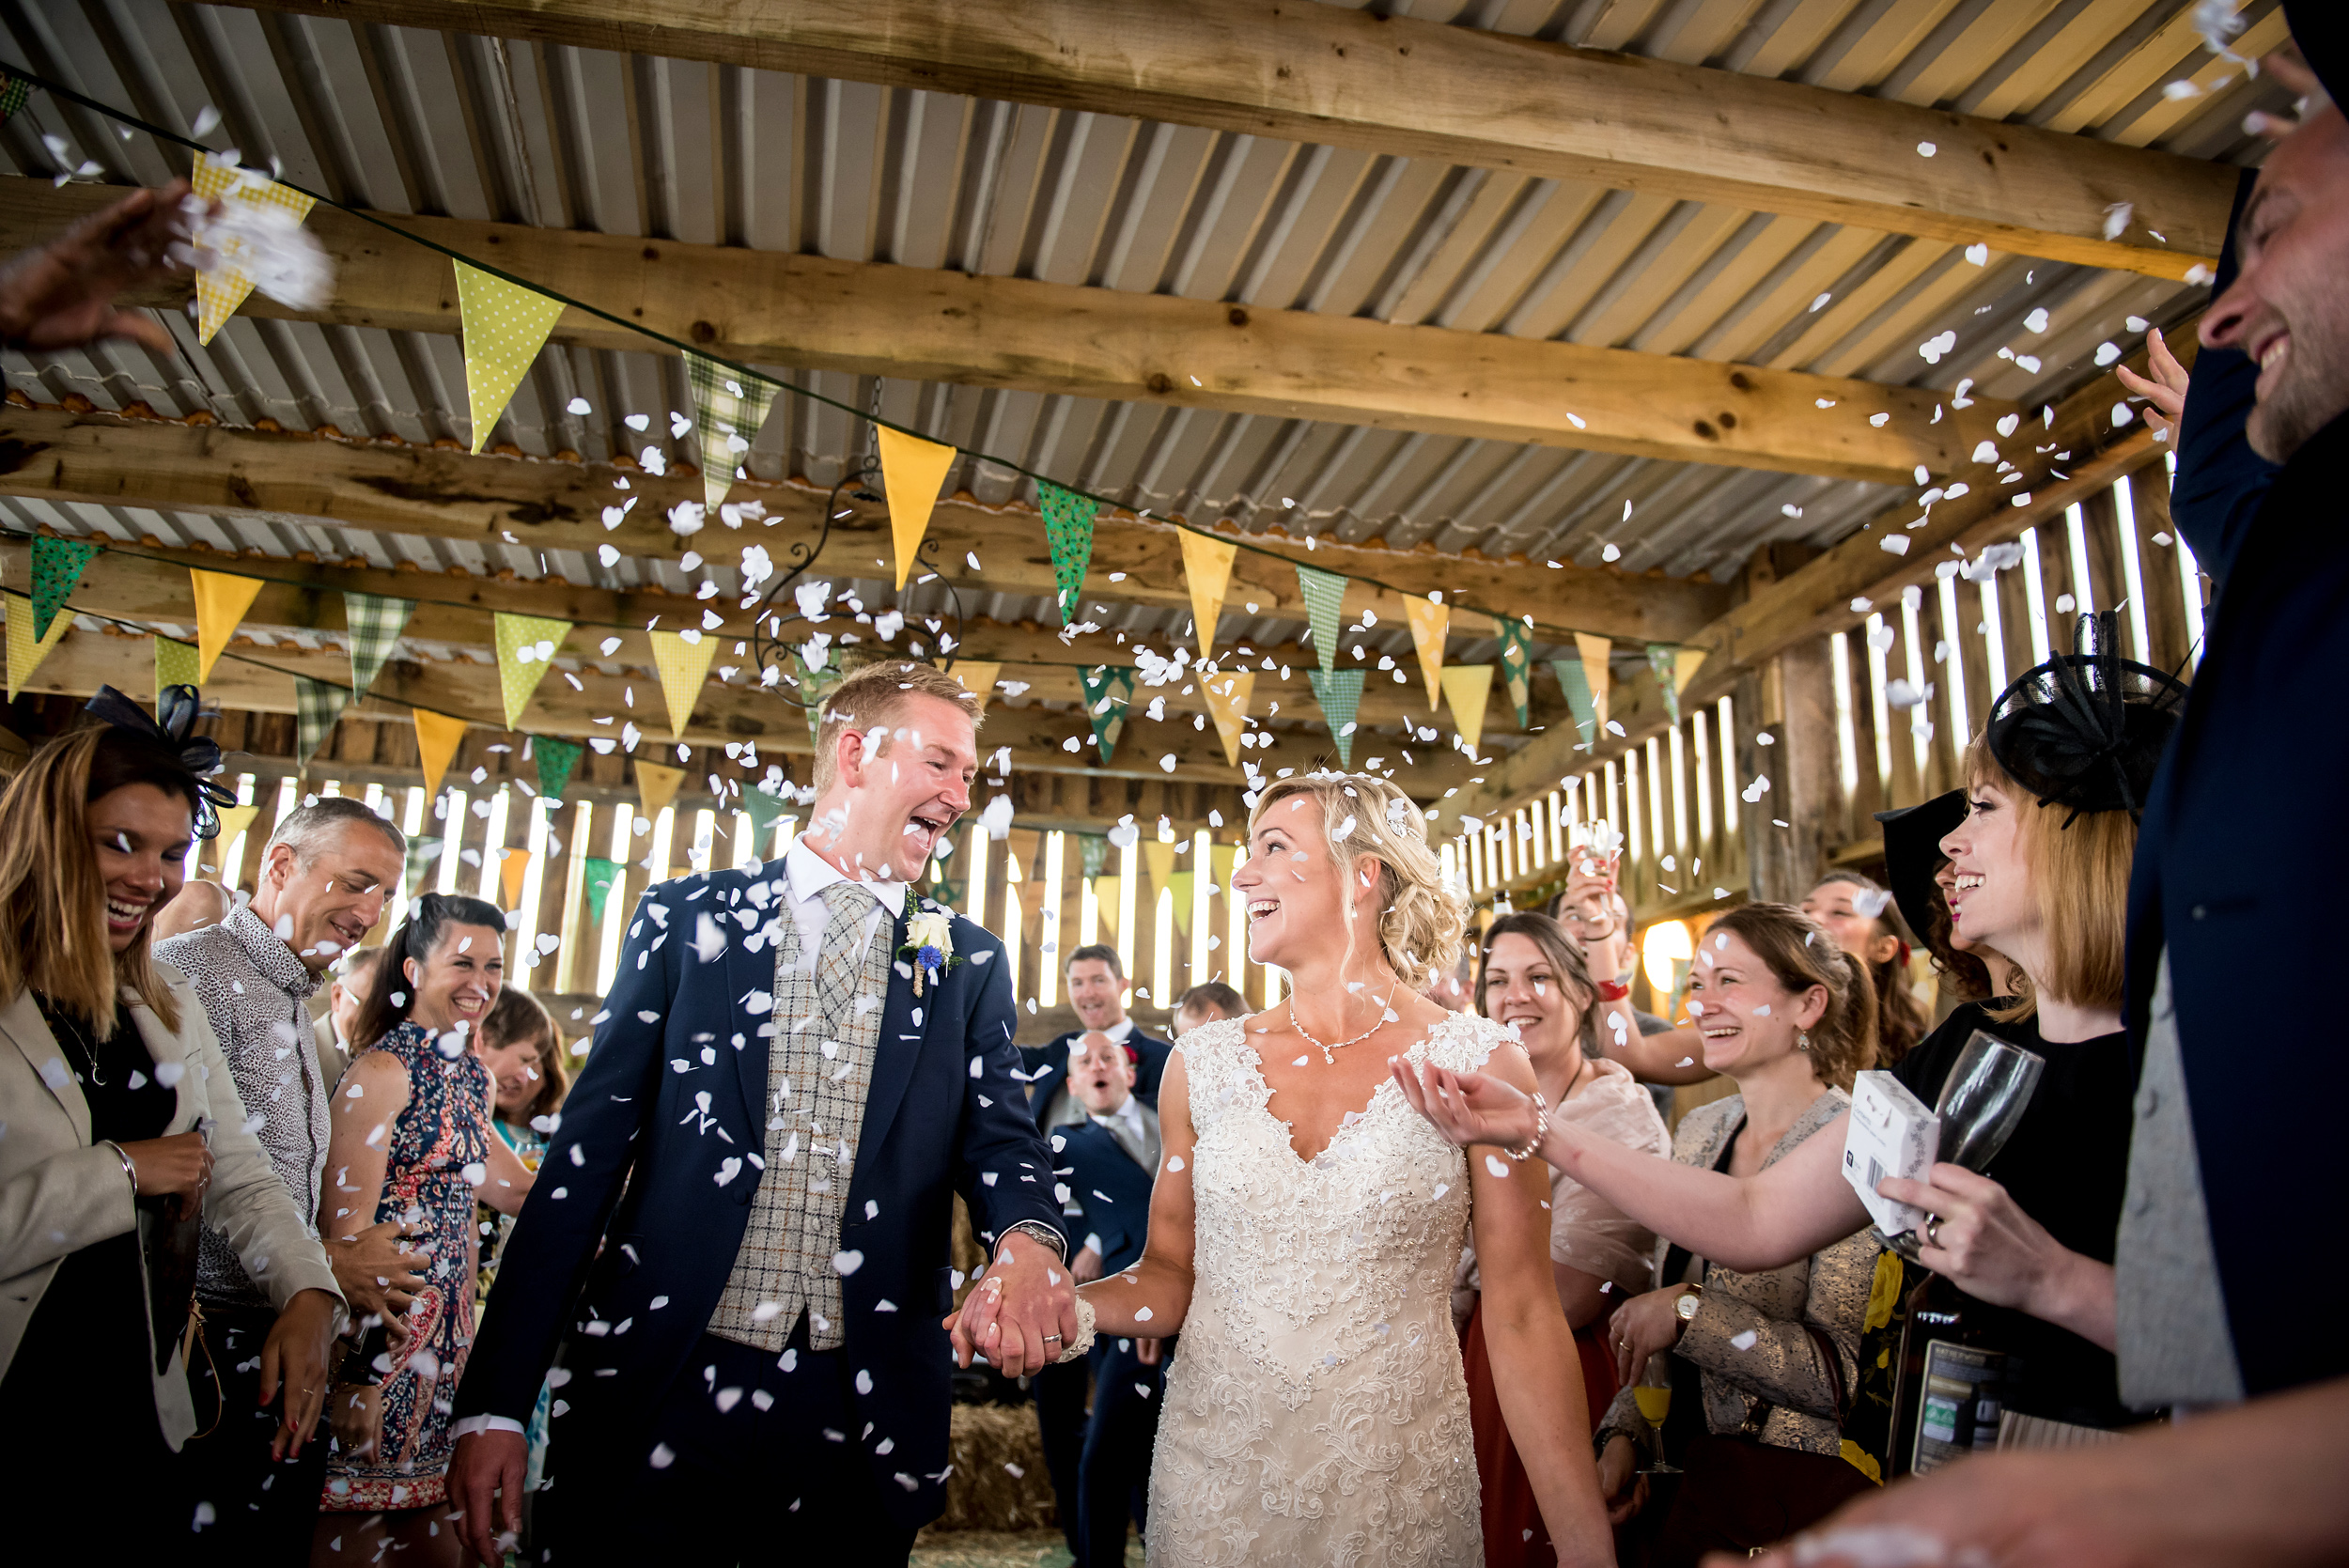 David Scholes Lancashire wedding photography 2016-115.jpg